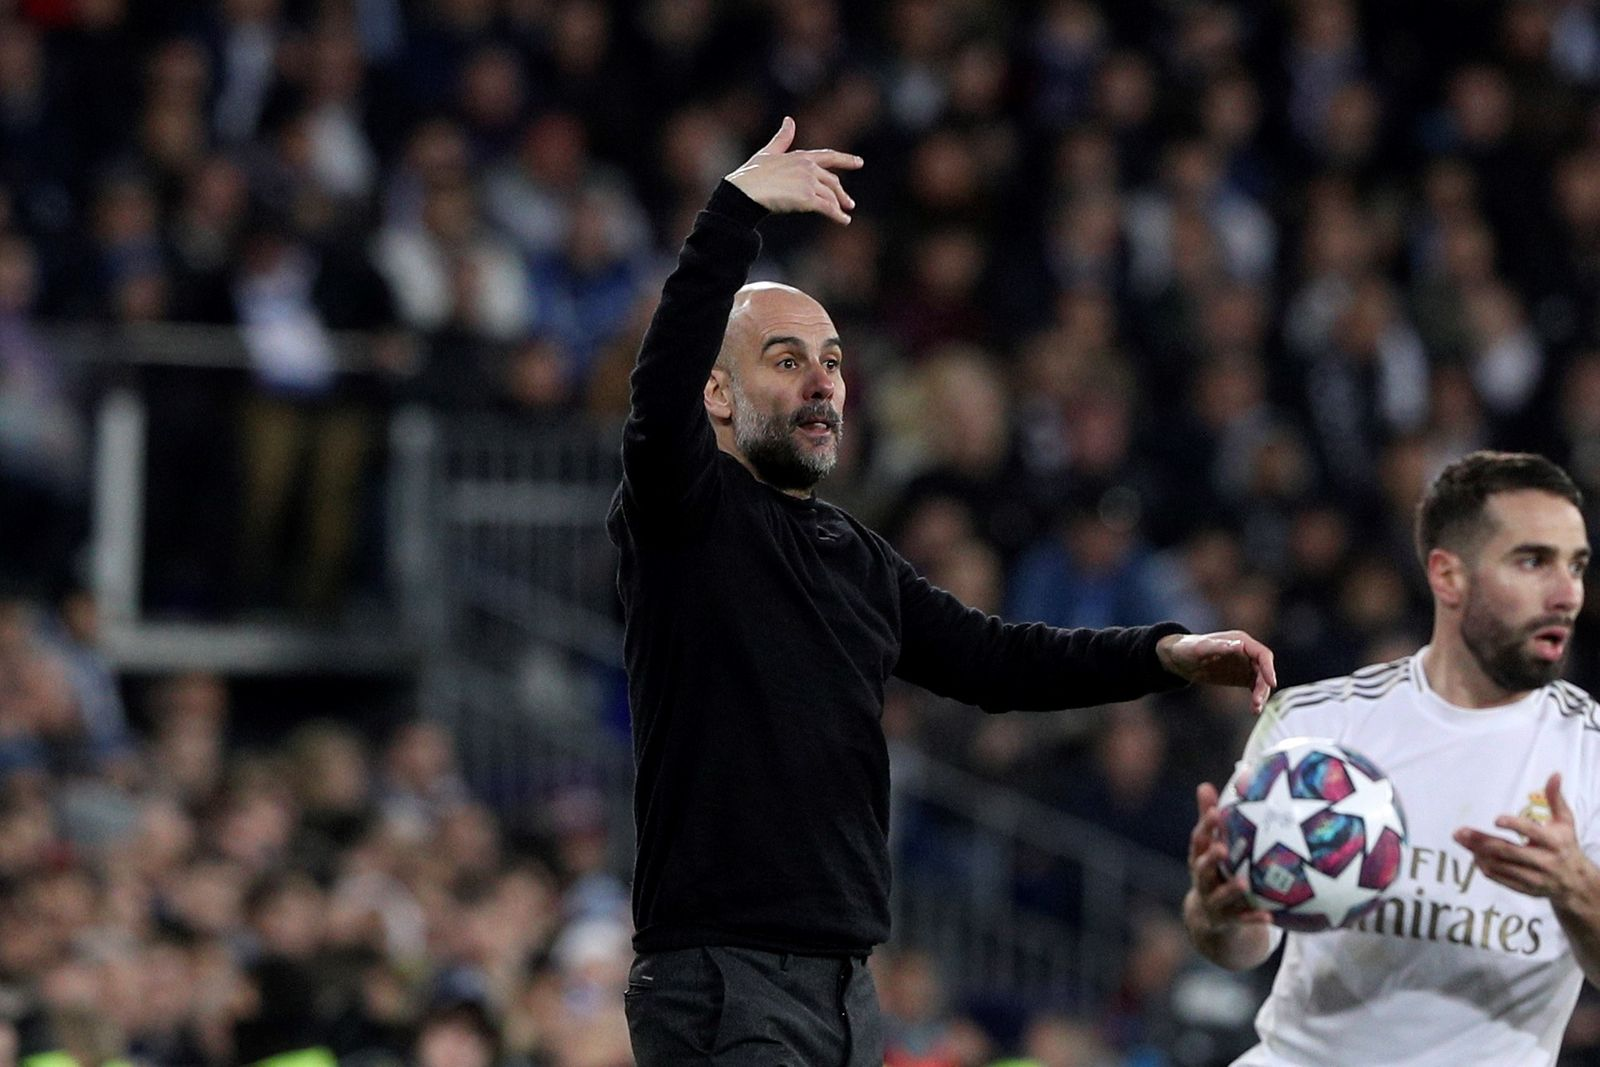 Real Madrid vs Manchester City, Spain - 26 Feb 2020